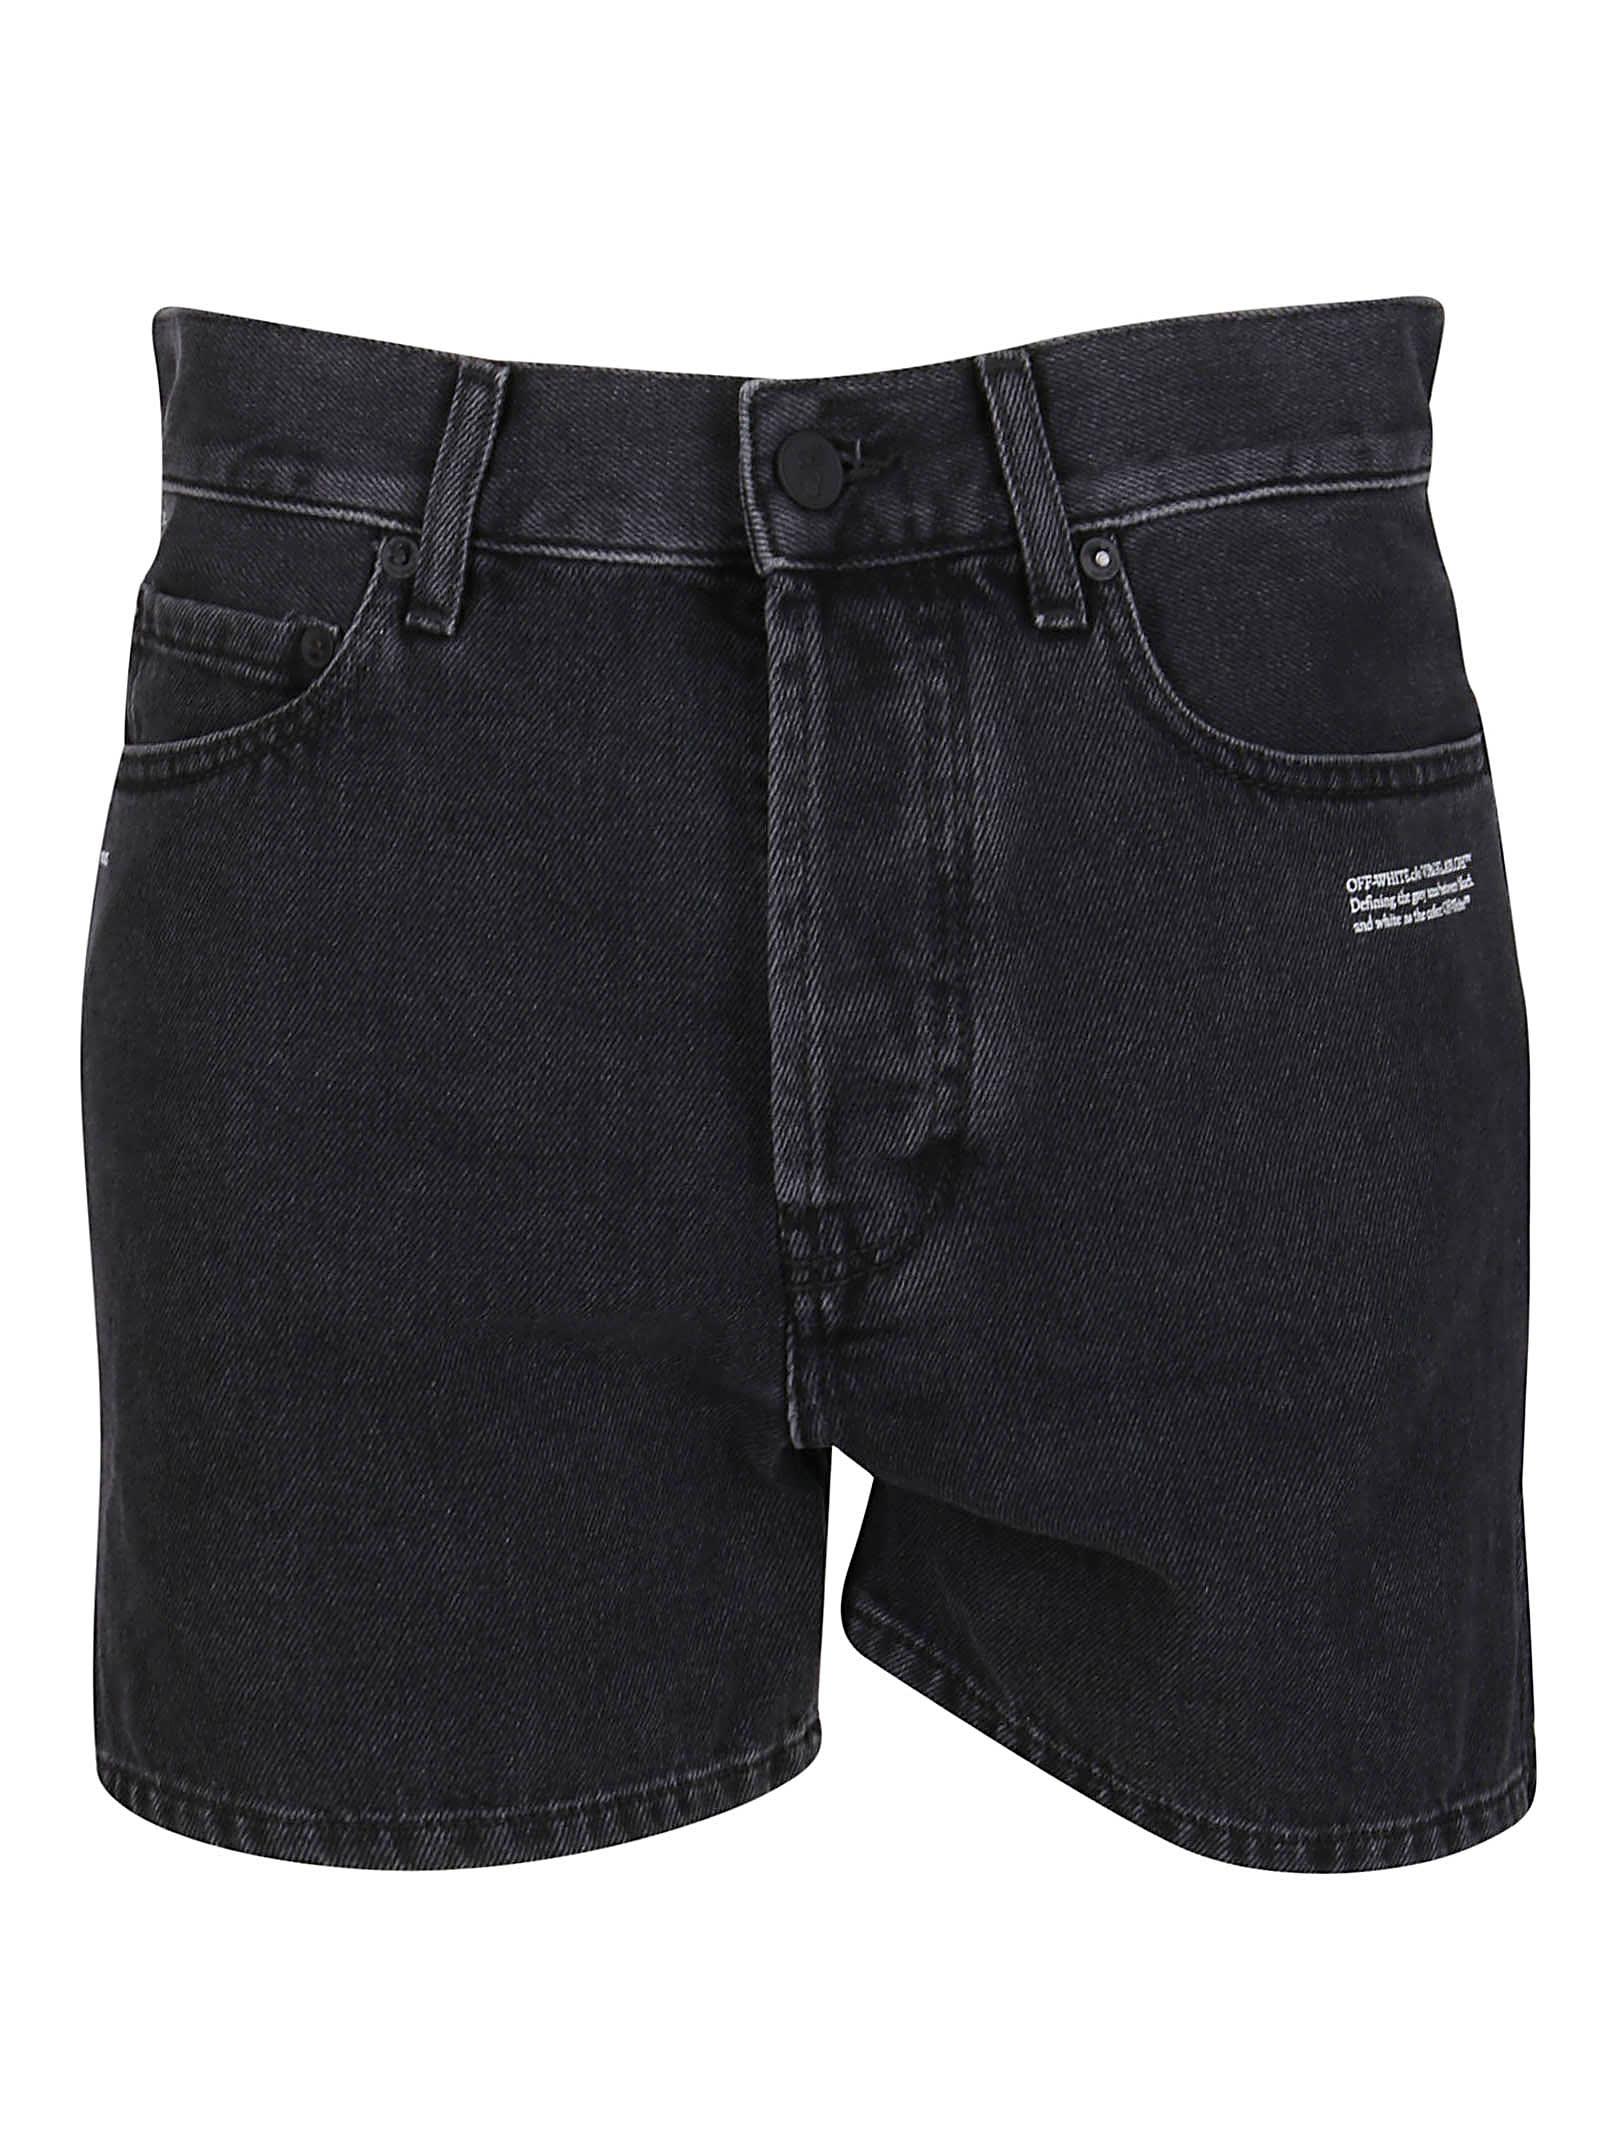 Off-White Shorts BLACK DENIM SHORTS